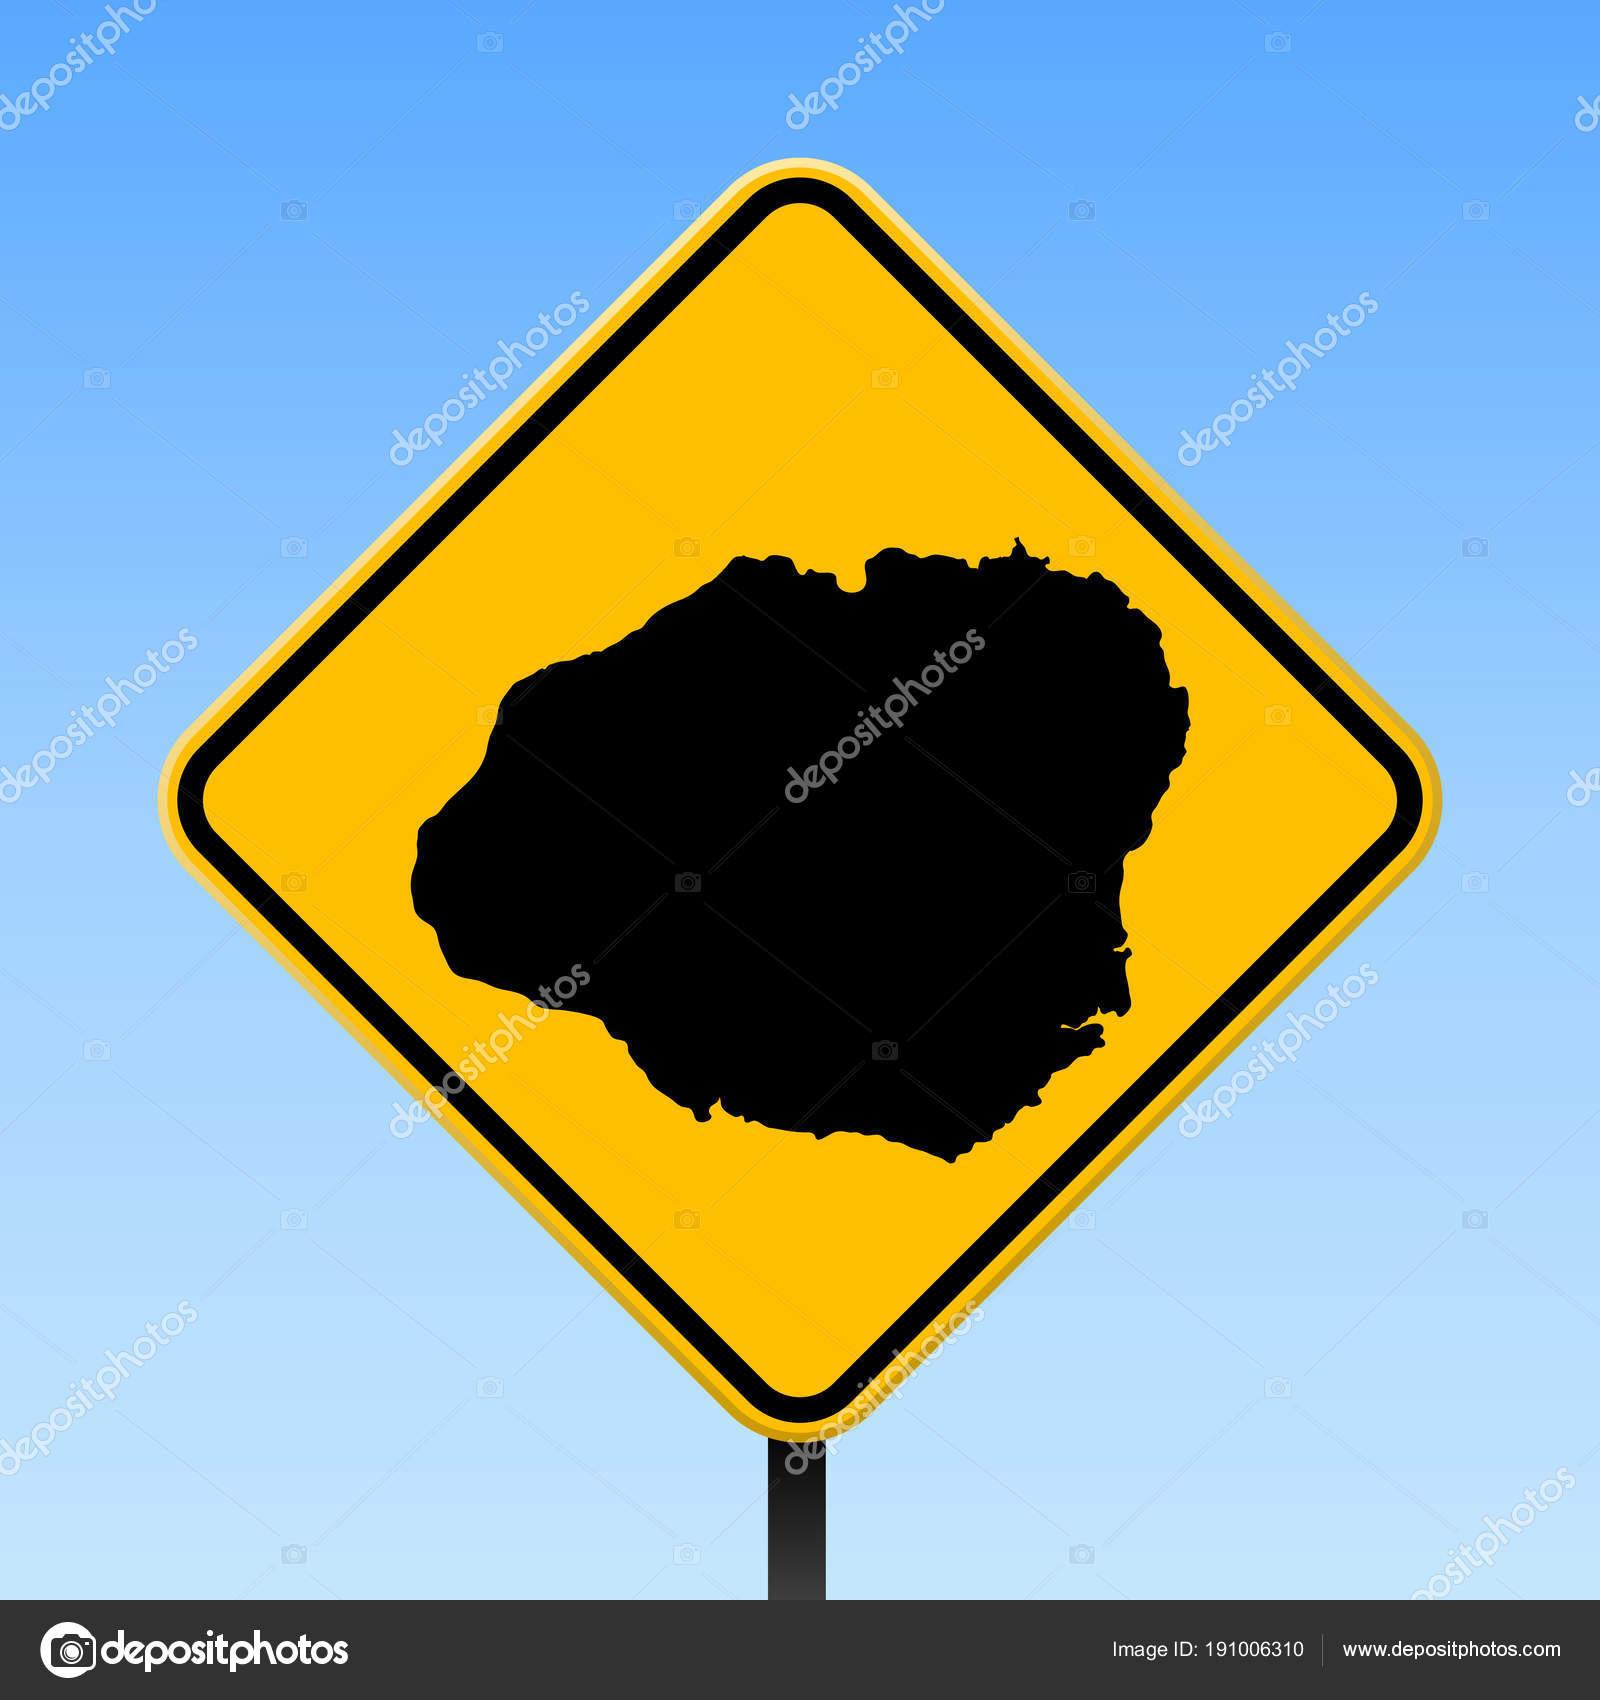 Kauai map on road sign Square poster with Kauai island map on yellow on kin map, kawasaki map, martin map, waldorf map, sacred ridge site map, iwate prefecture map, iwaizumi map, baldwin map, marshall map,